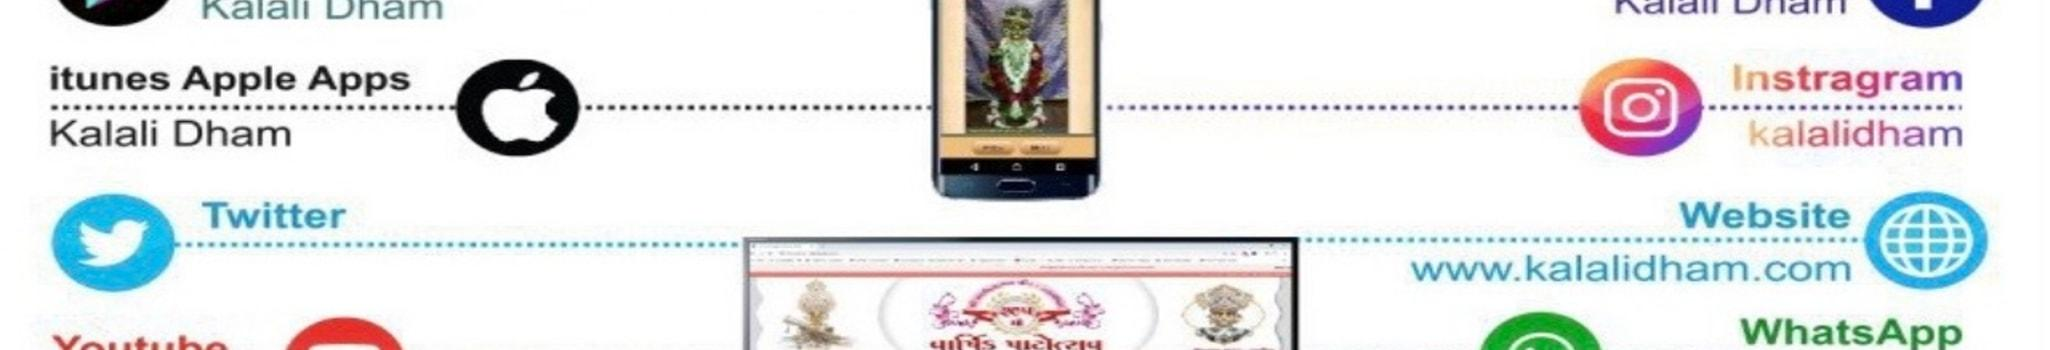 Kalali Dham